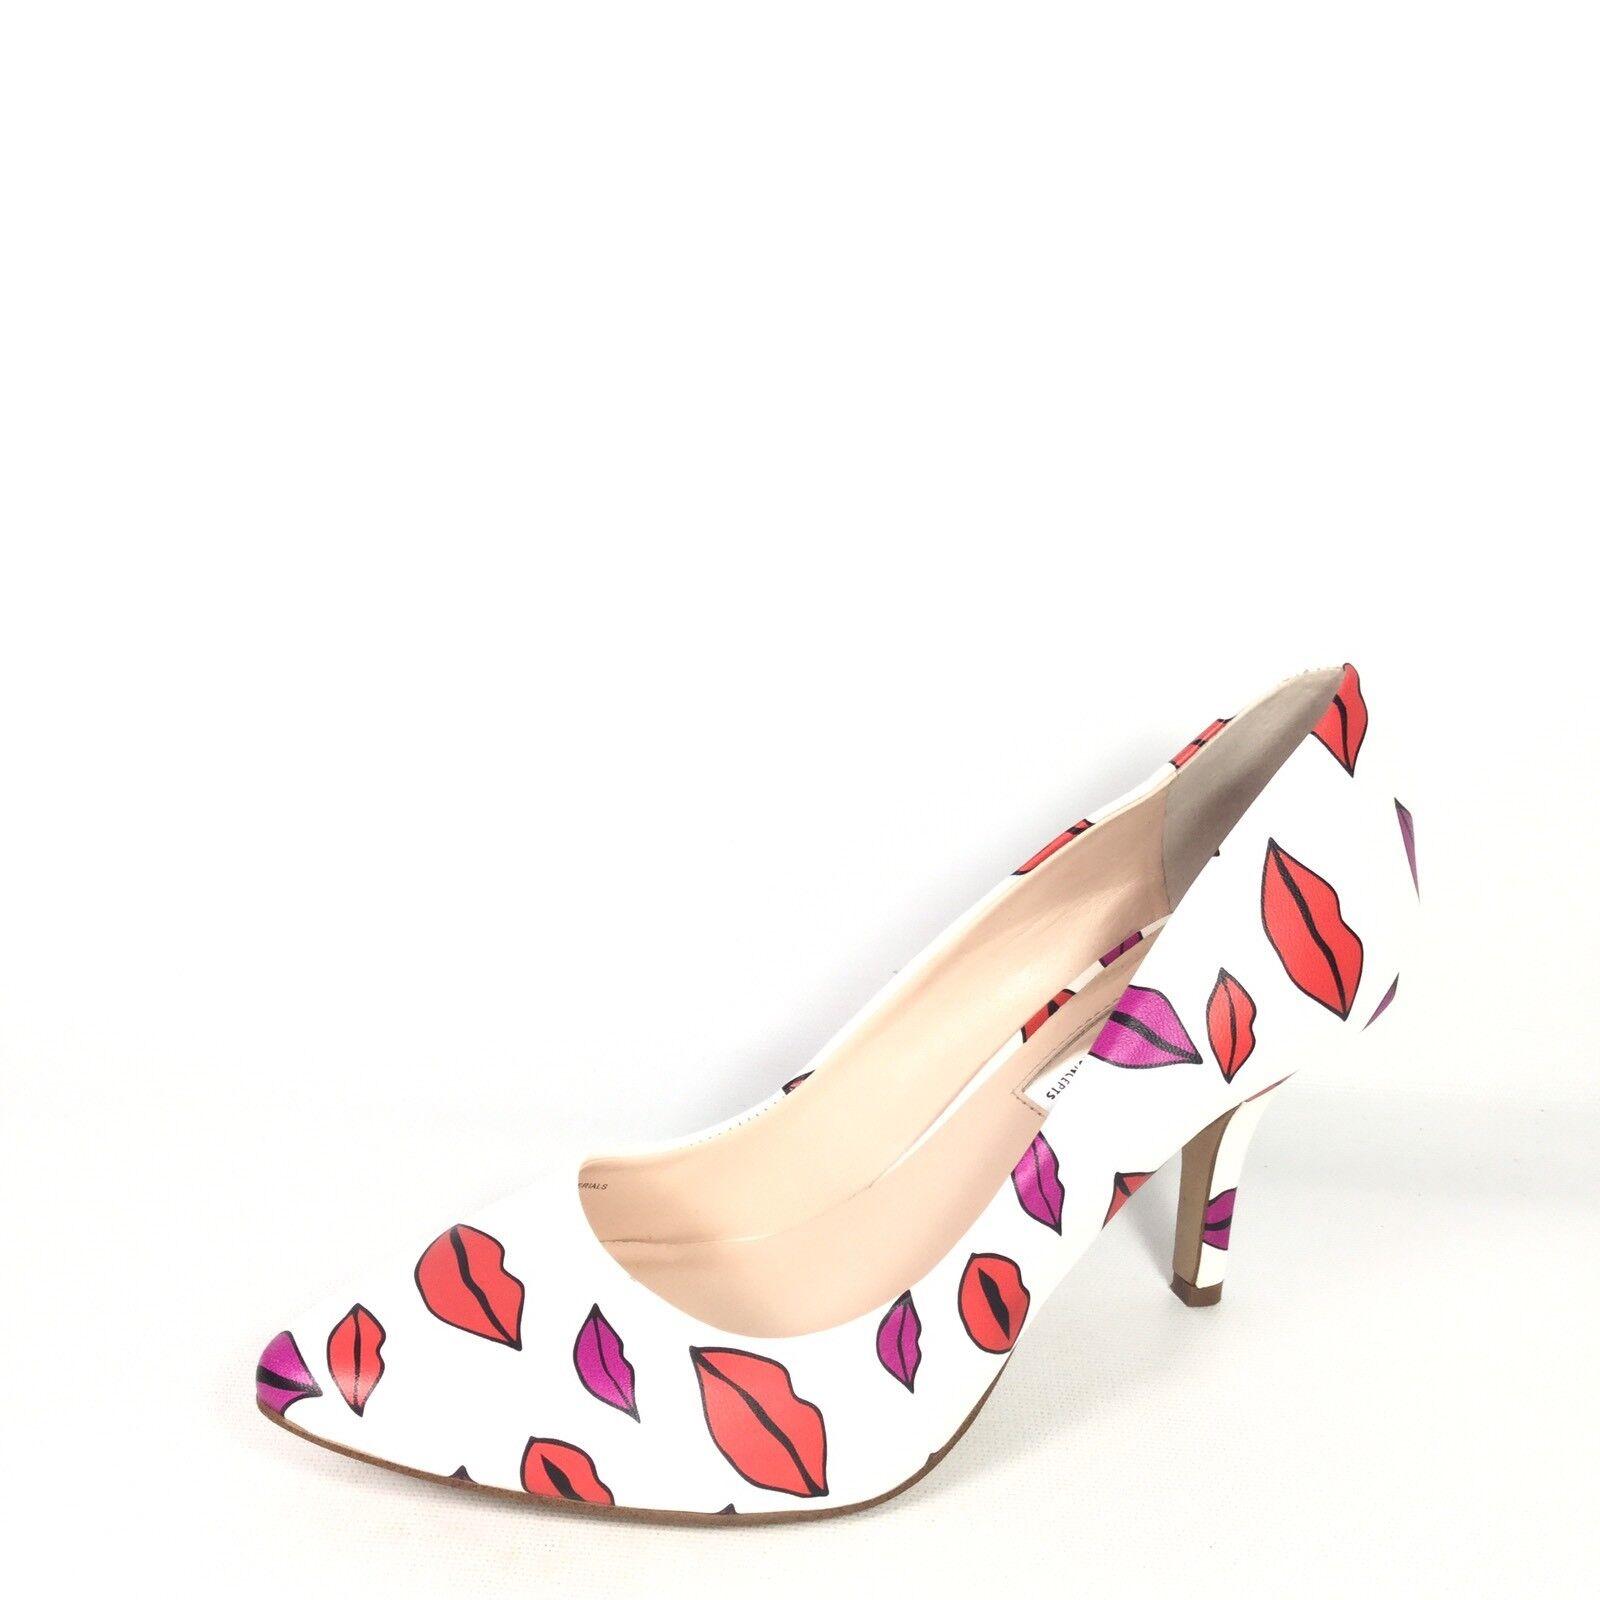 International Concepts Zitah Womens Size 7.5 M Lips  White Pump Dress shoes.